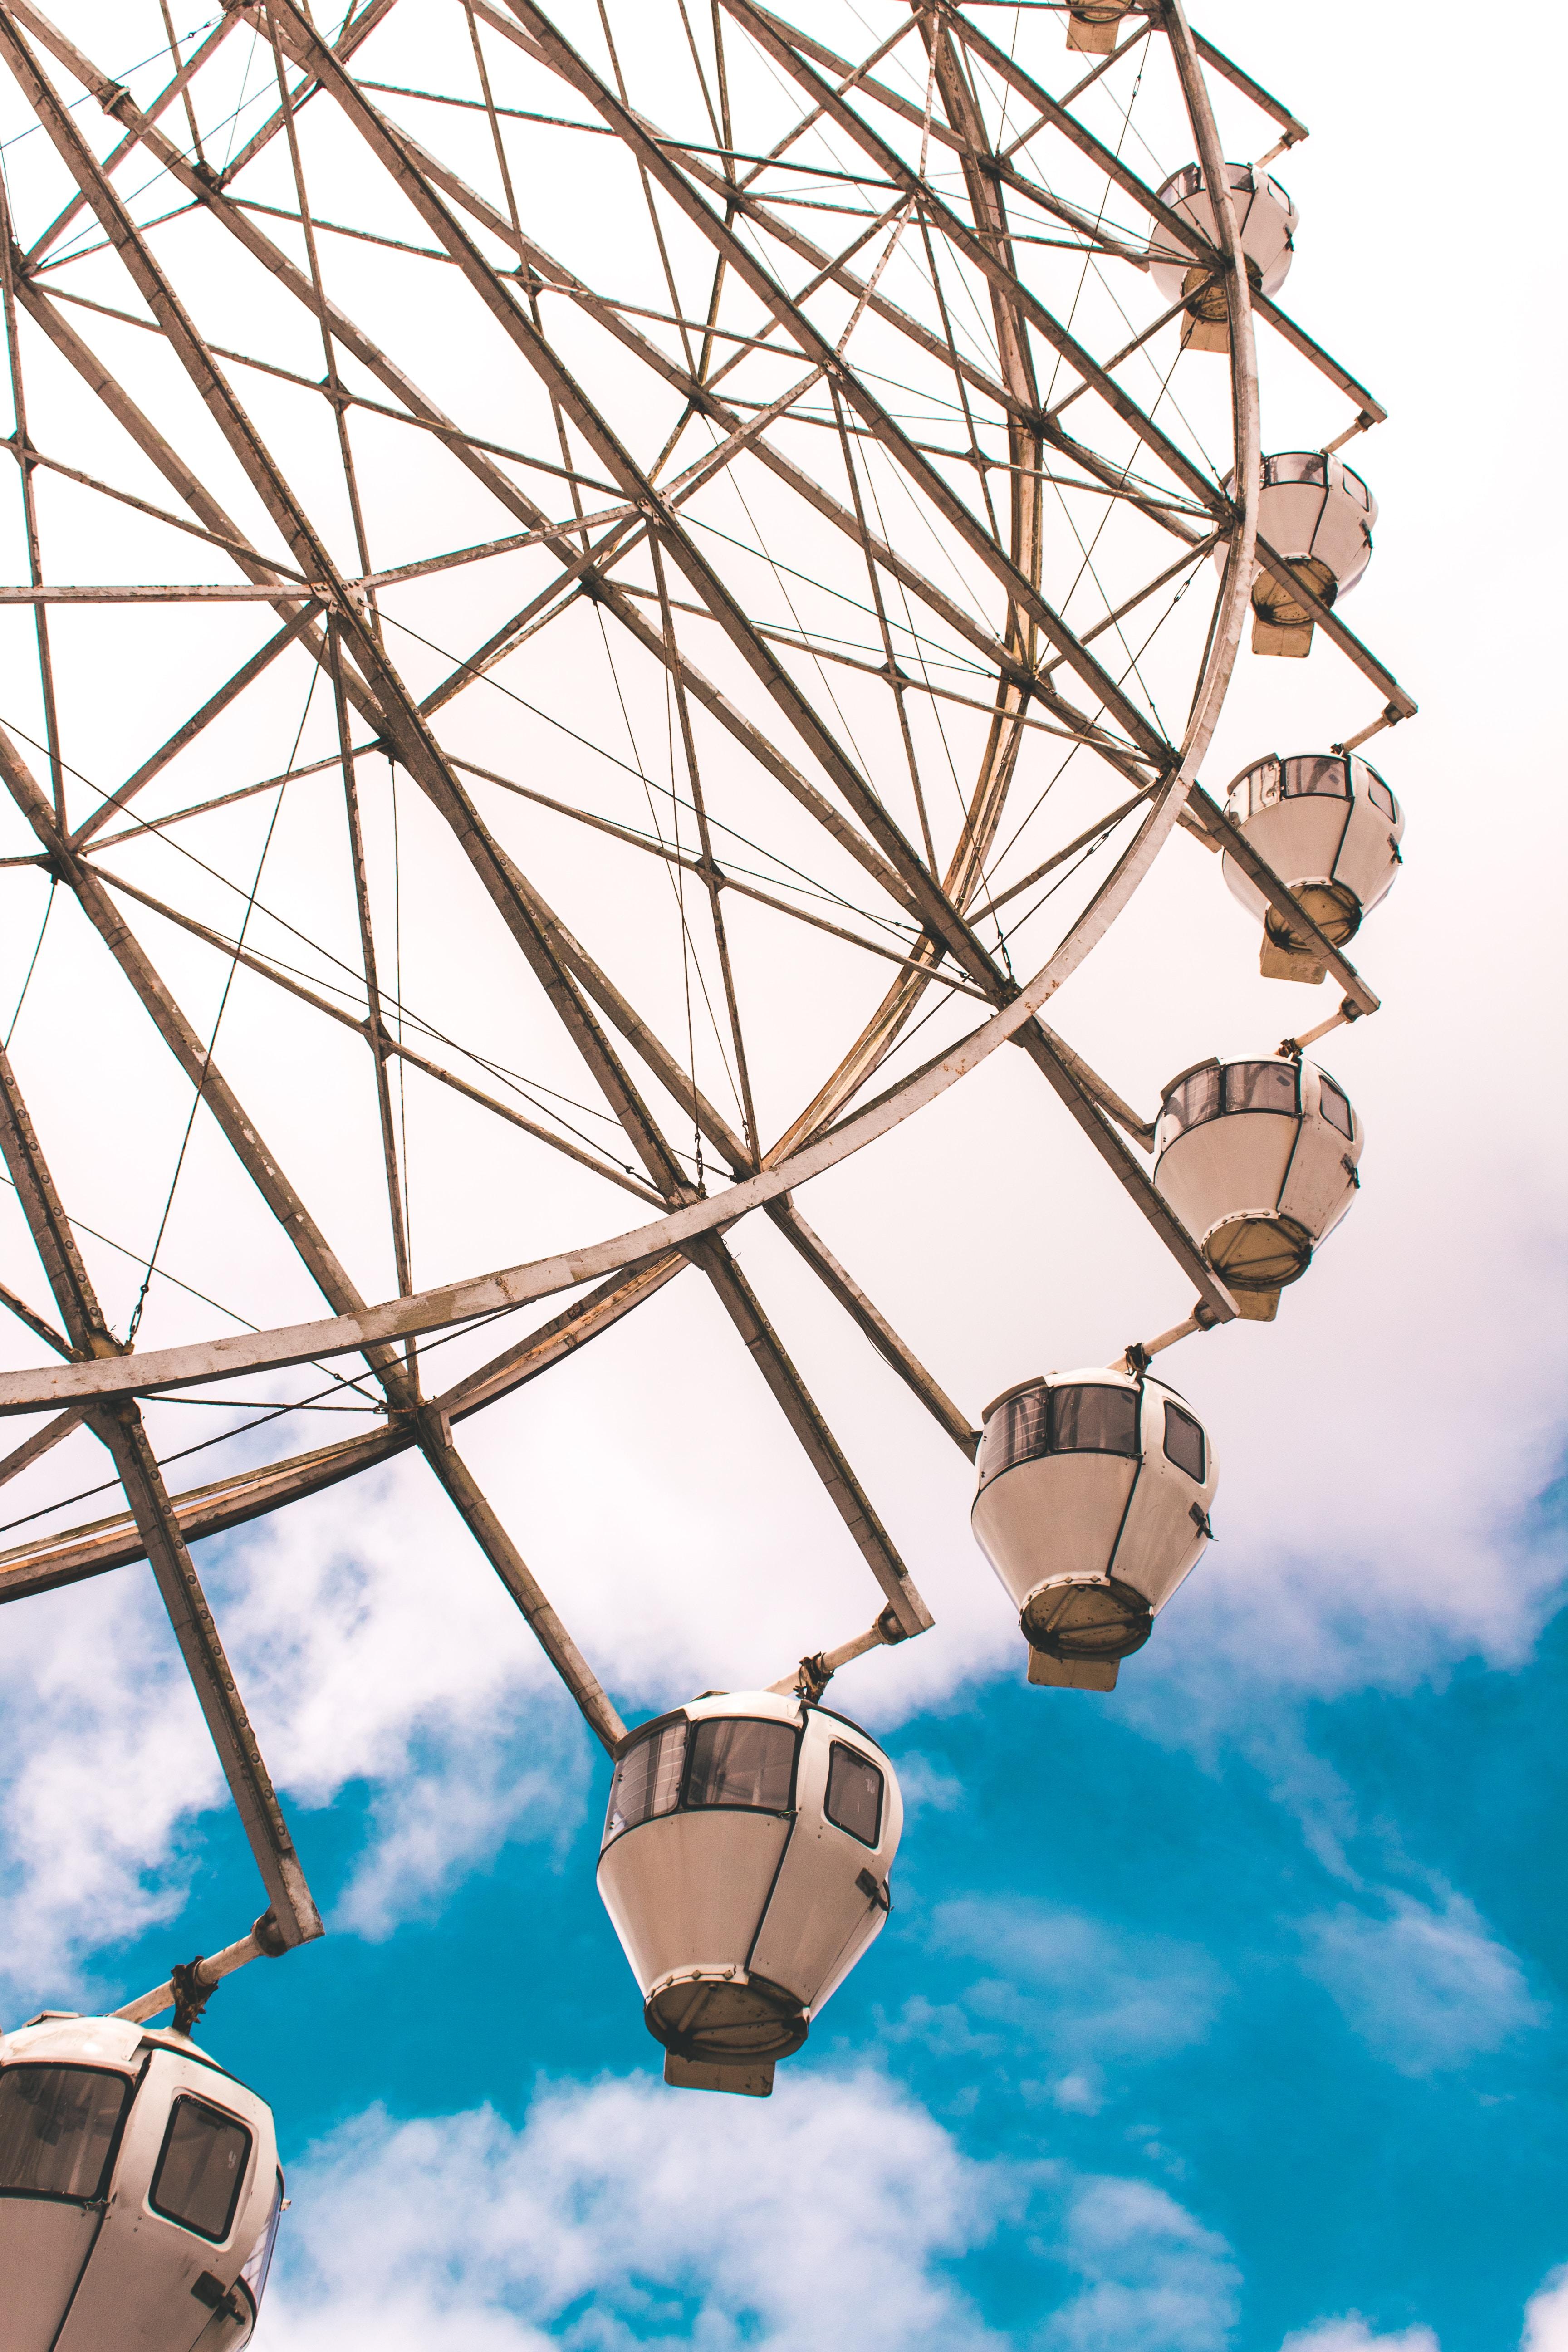 wormseye view of ferriswheel under blue sky